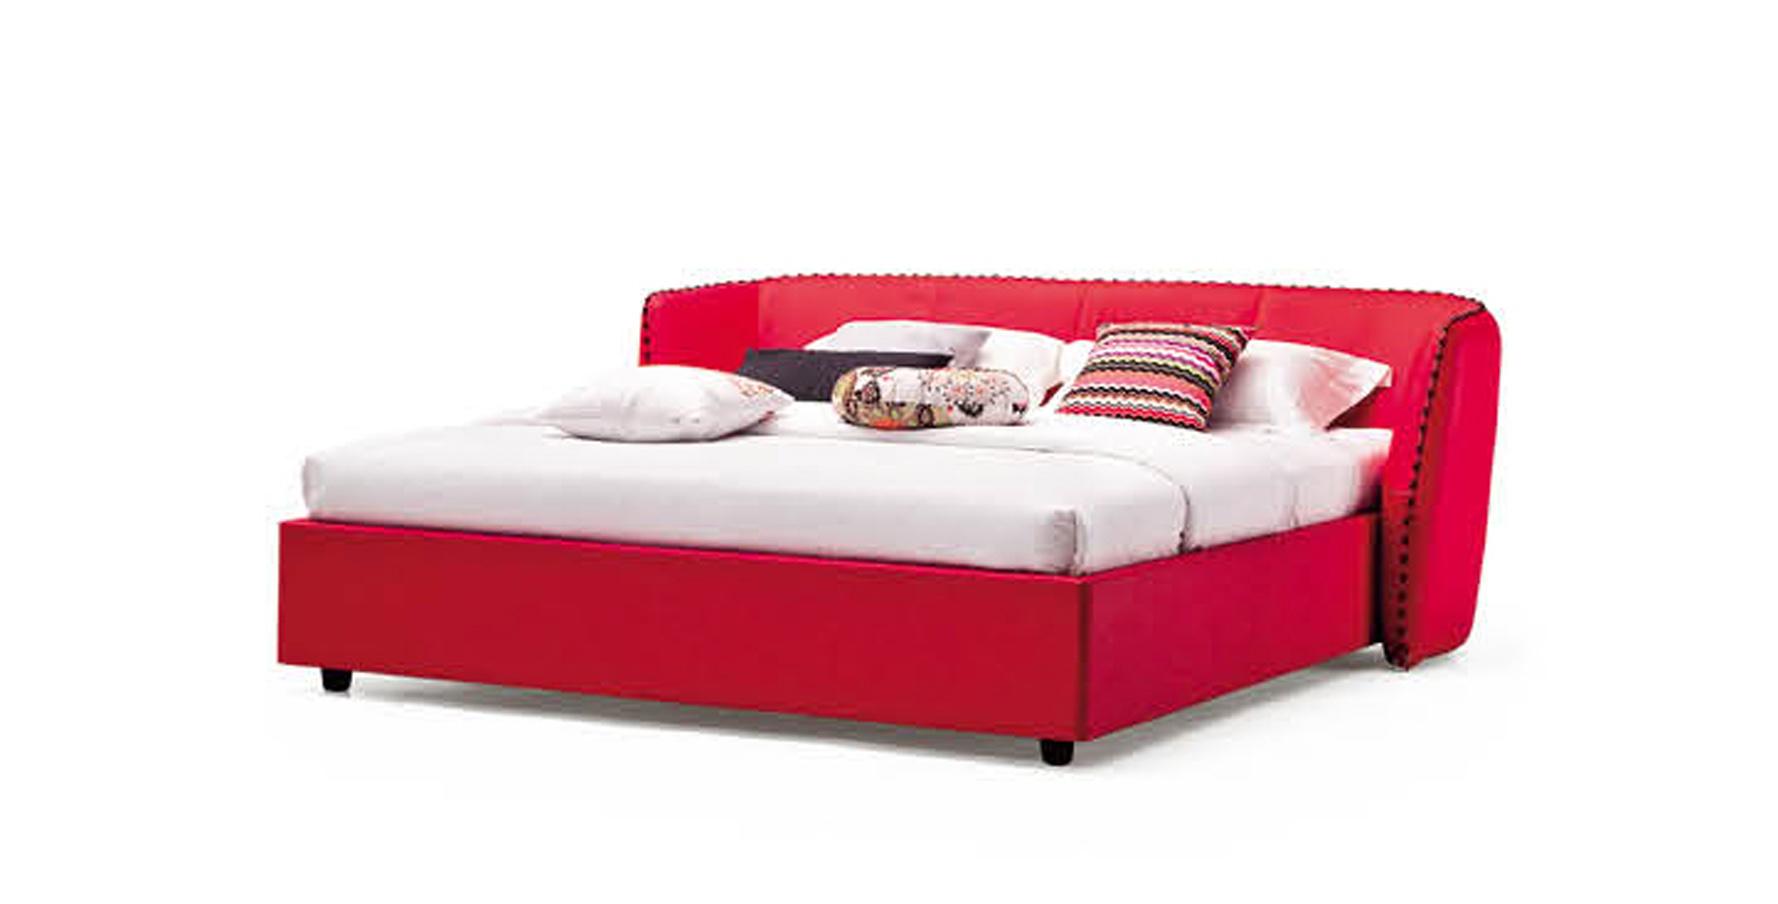 Red Platform Bed 28 Images Aven Modern Red Leather